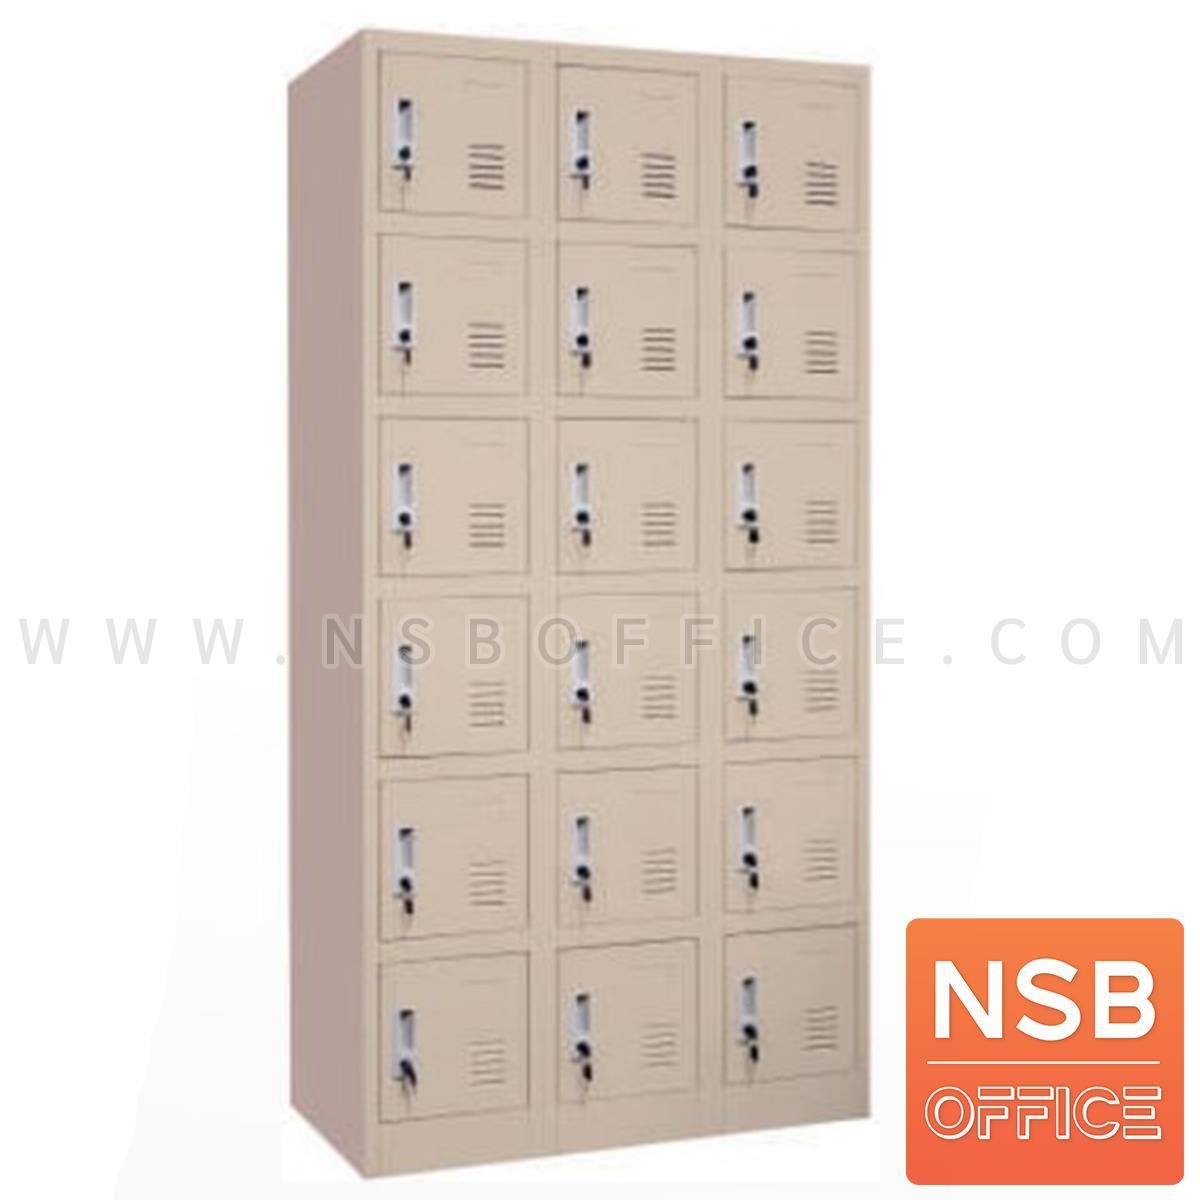 E03A060:ตู้ล็อกเกอร์ 18 ประตู  รุ่น Wheelie (วีลลี่) ขนาด 91.7W*54.7D*185H cm.